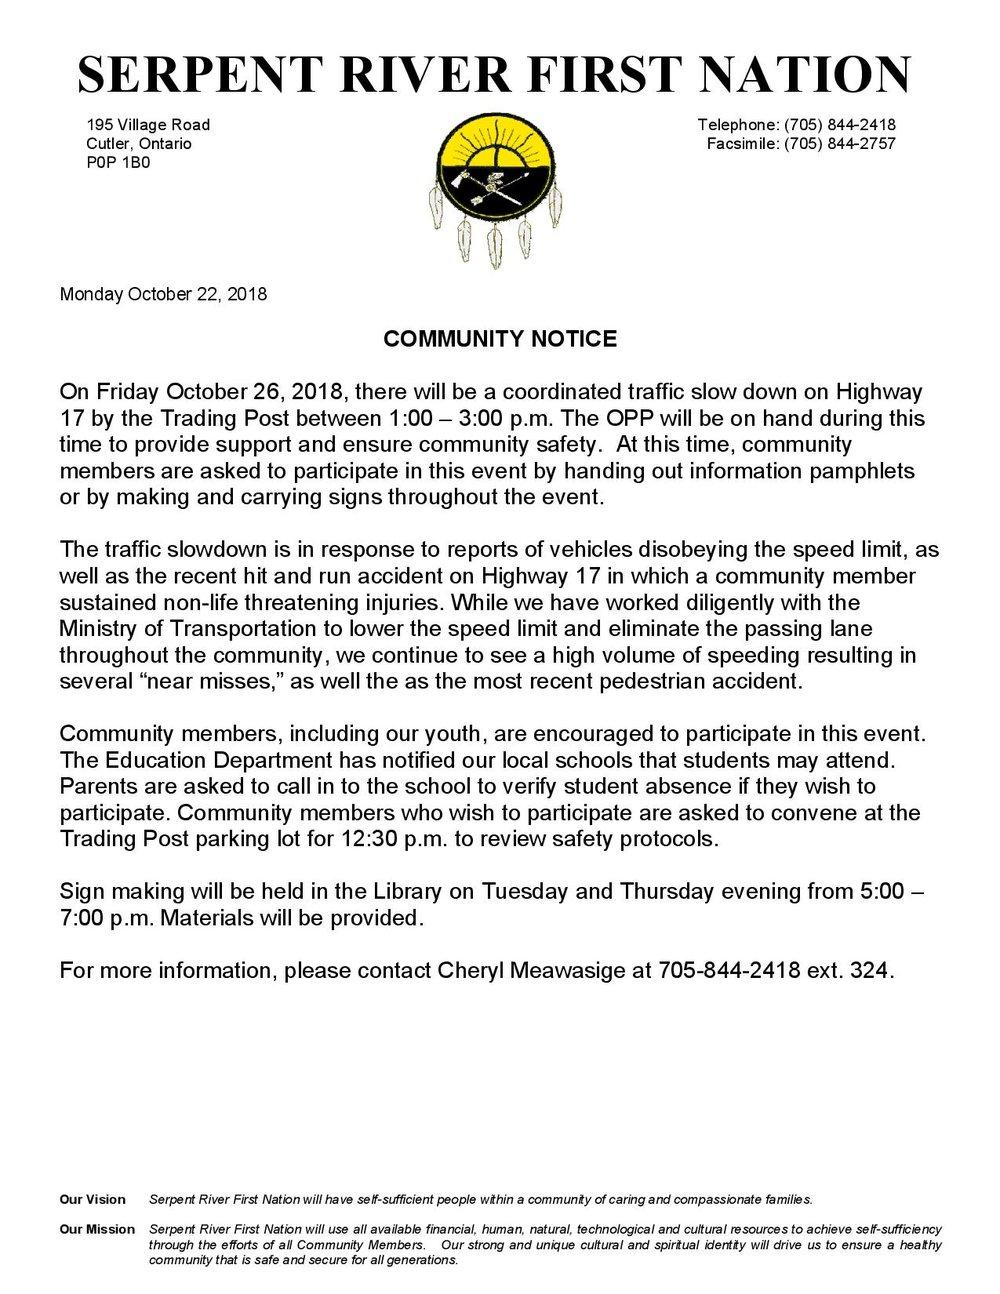 traffic notice-page-001.jpg